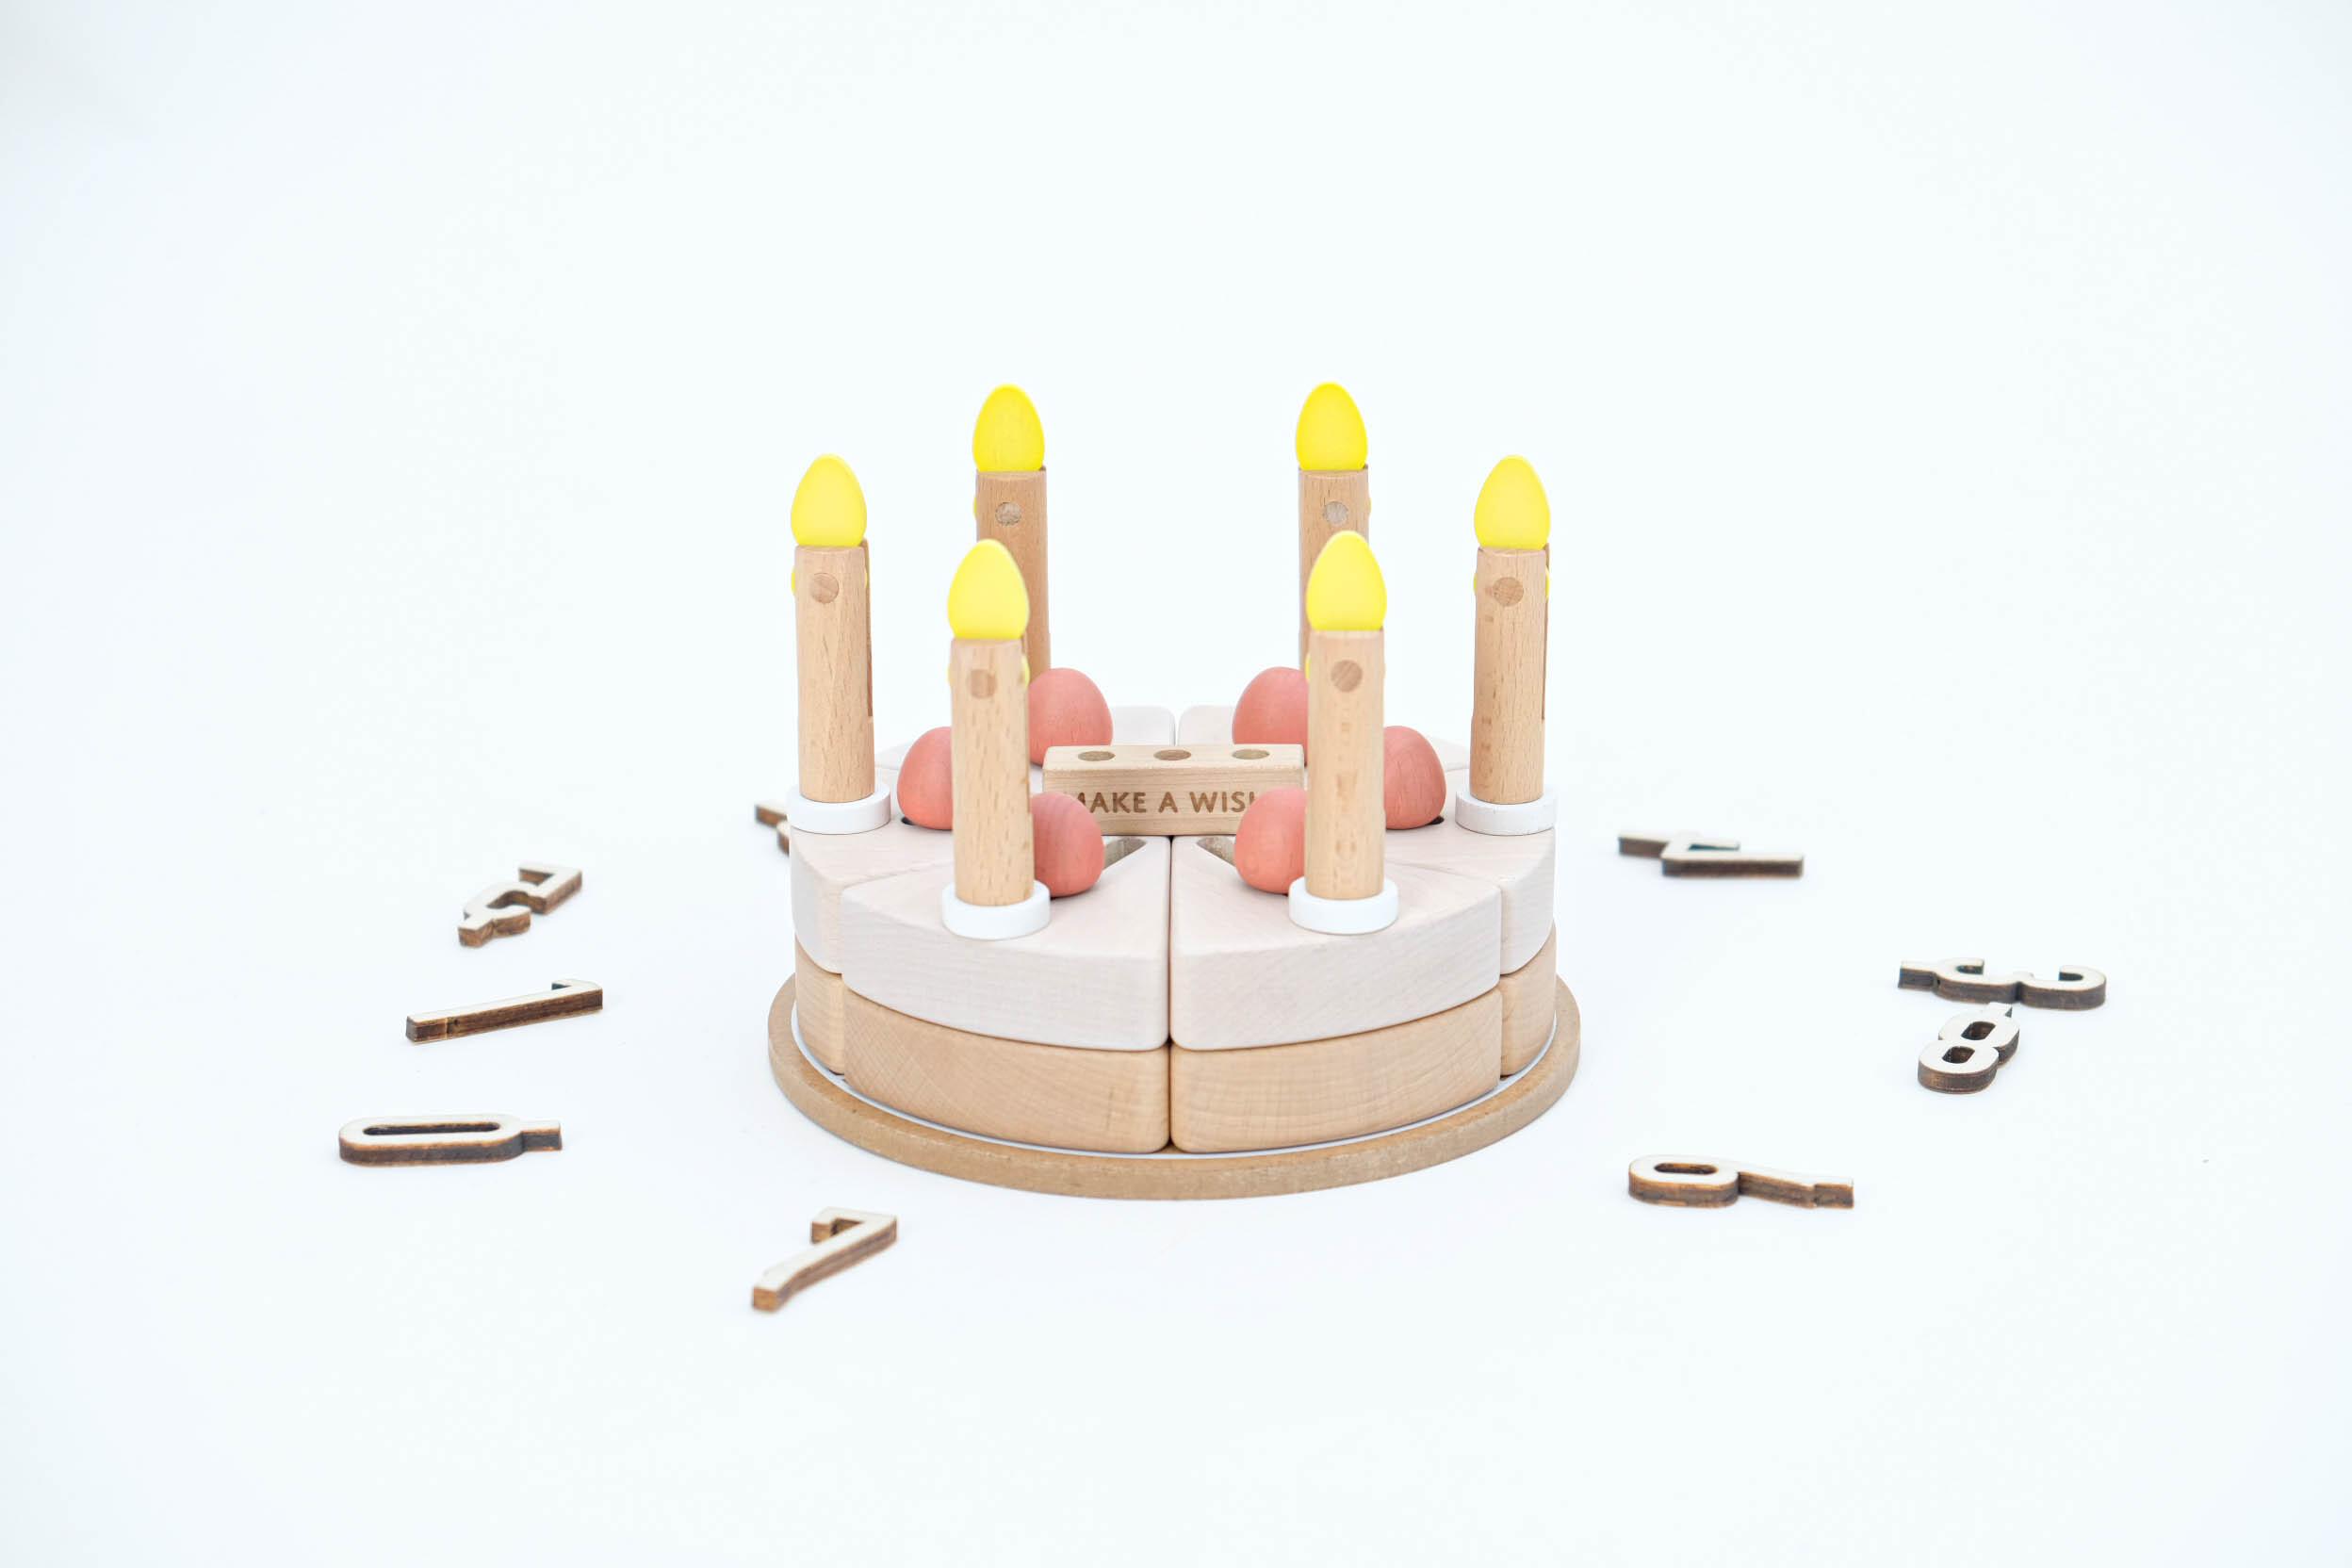 【dou toy】make a wish 木のケーキ おままごと